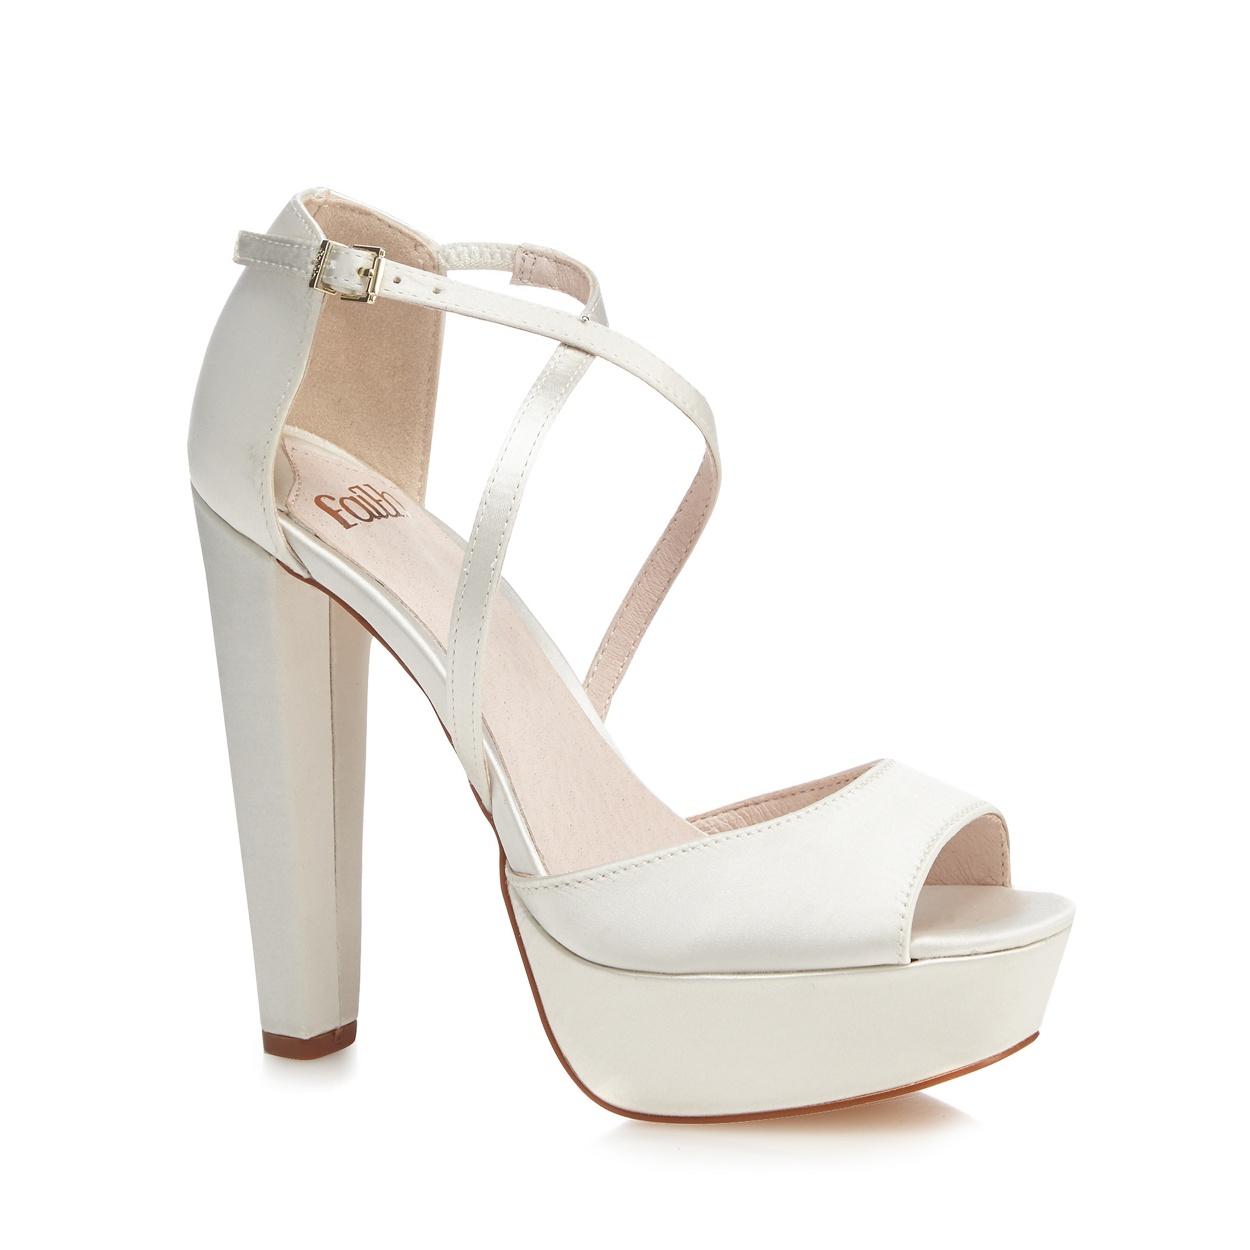 Women's sandals debenhams - Faith Ivory Daniella High Platform Heel Peep Toe Sandals